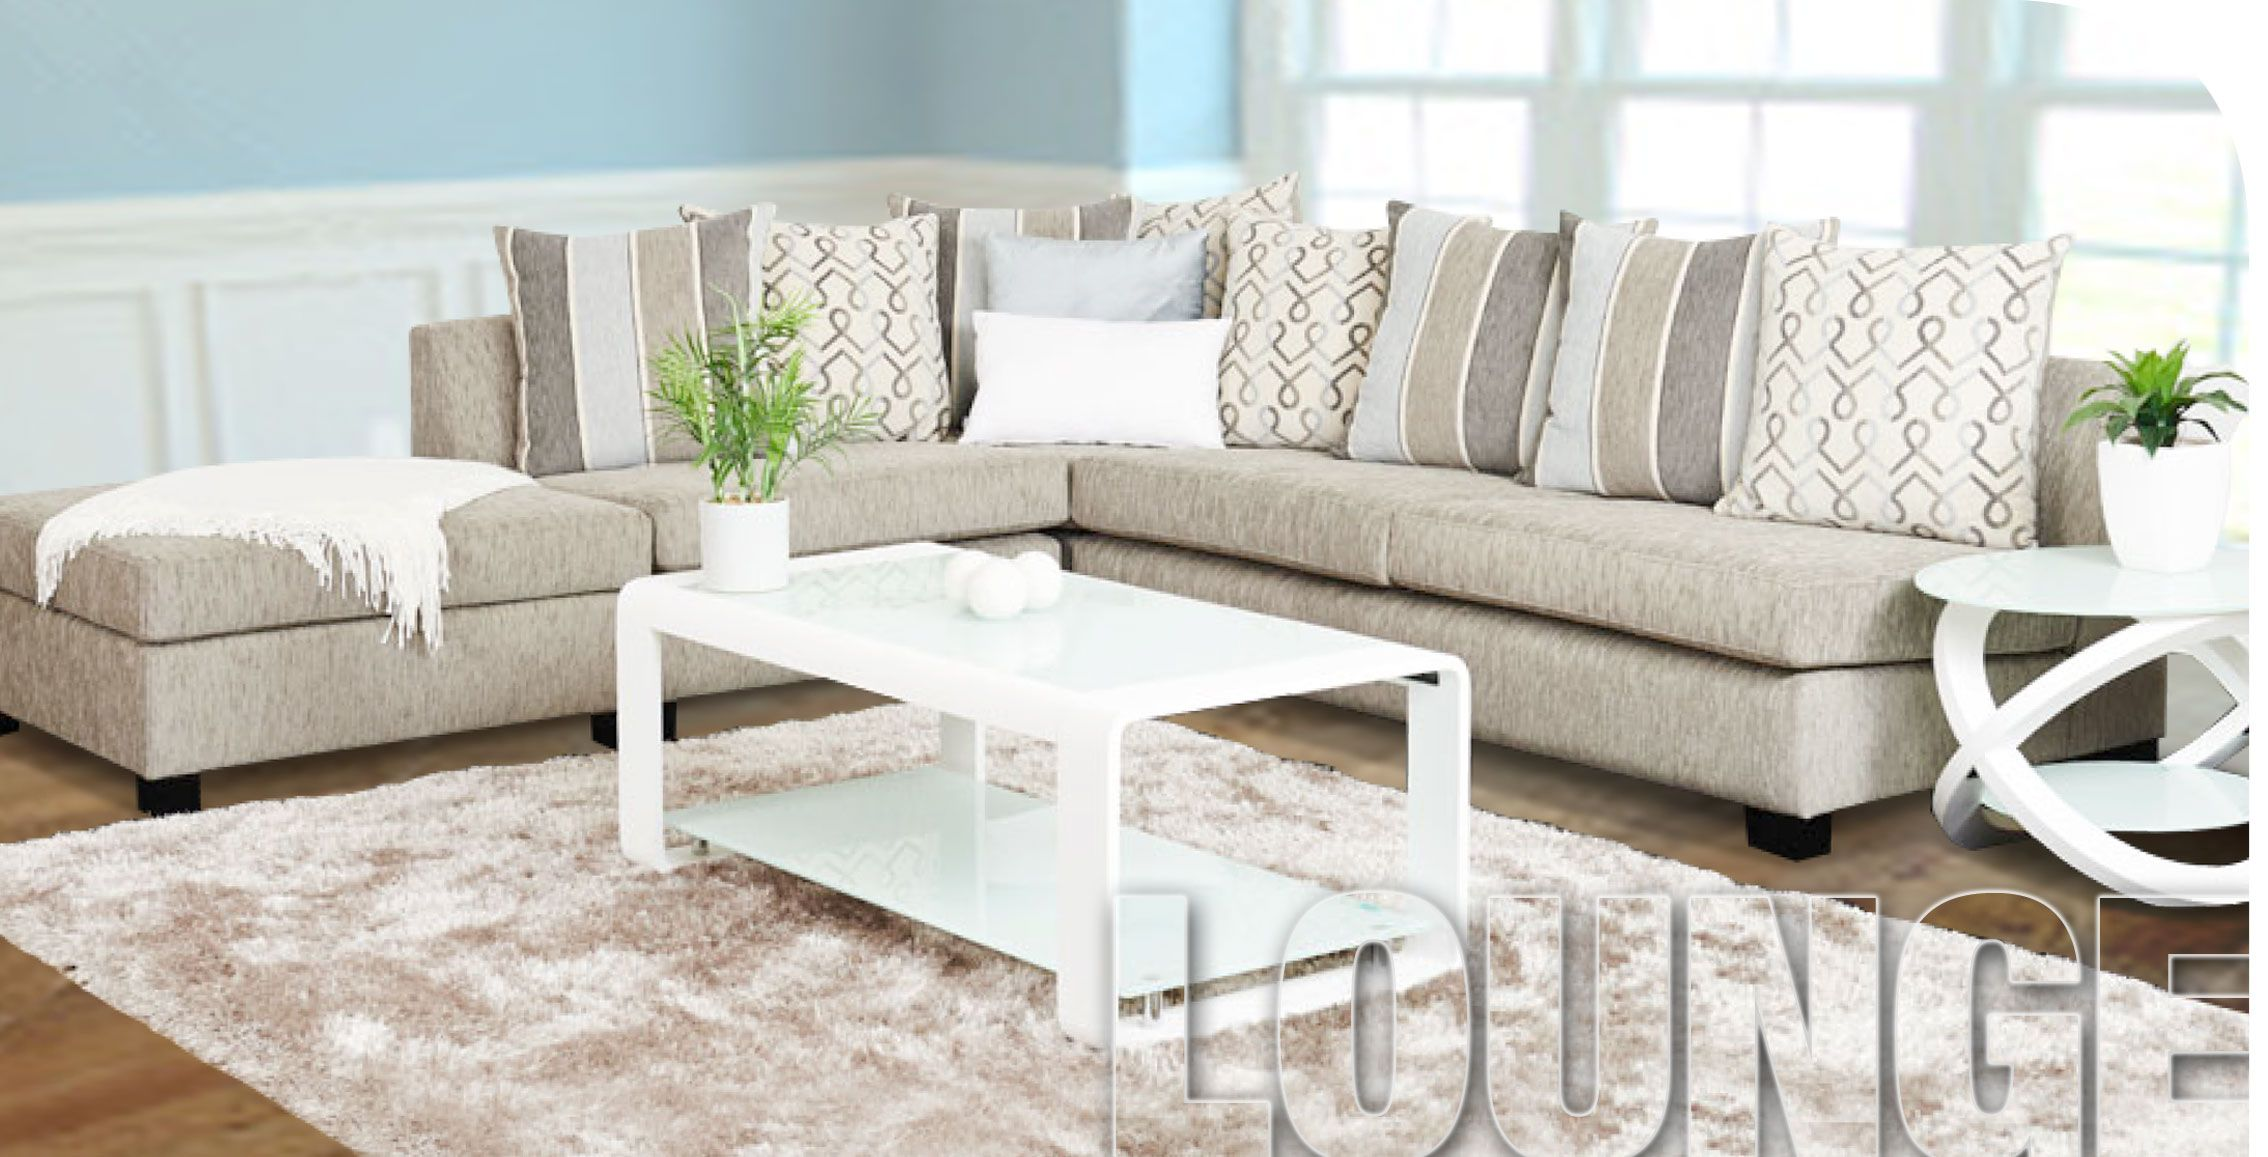 nz lounge ideas - Google Search cool corner sofa   Home ideas ...